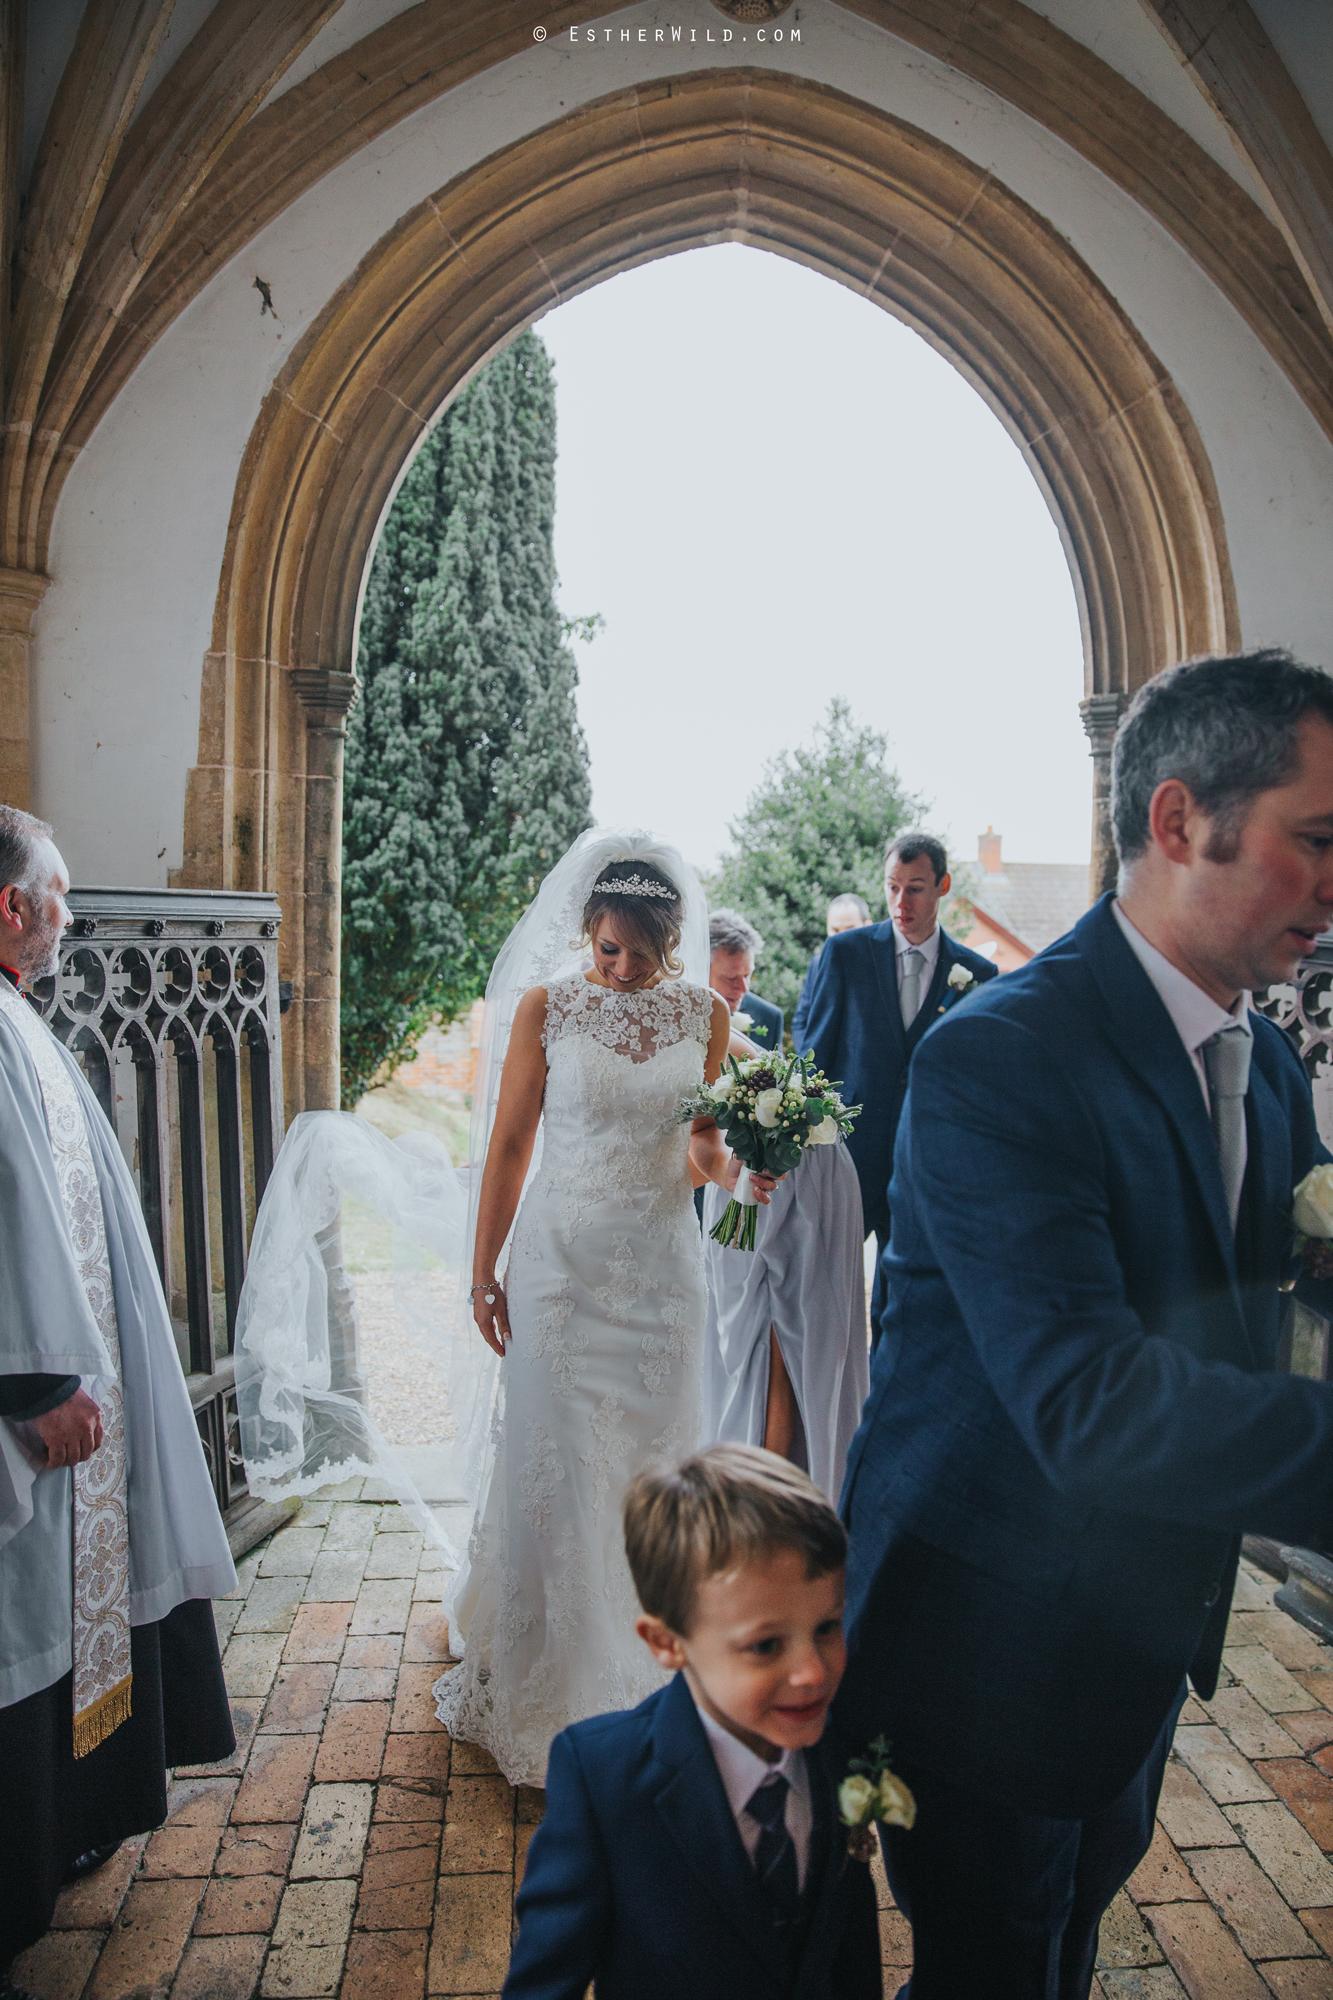 Wedding_Photography_Diss_Gawdy_Hall_Redenhall_Church_Norfolk_Winter_Esther_Wild_Copyright_IMG_1054.jpg